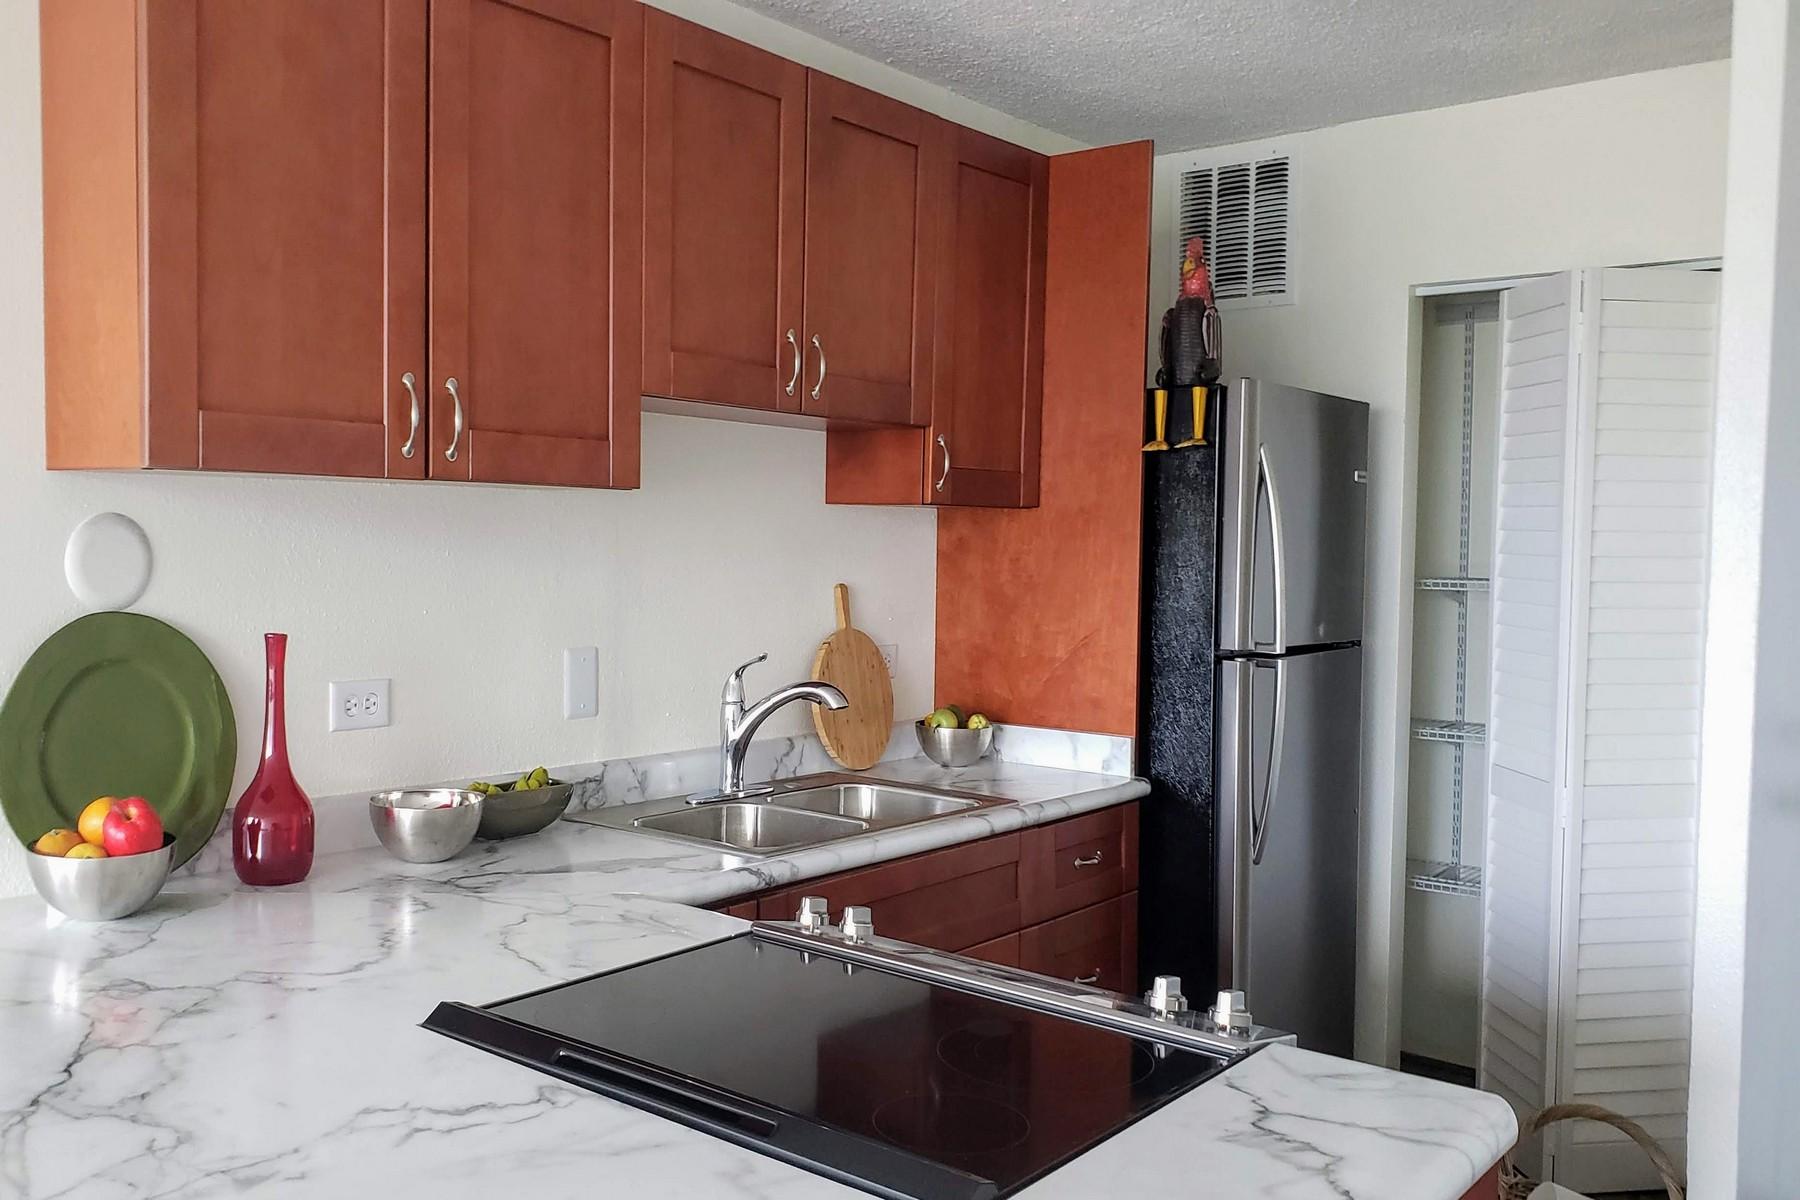 Condominiums 용 매매 에 Great 2 bedroom condo value with Wonderful Views! 111 Kahului Beach Rd, Harbor Lights D324, Kahului, 하와이 96732 미국